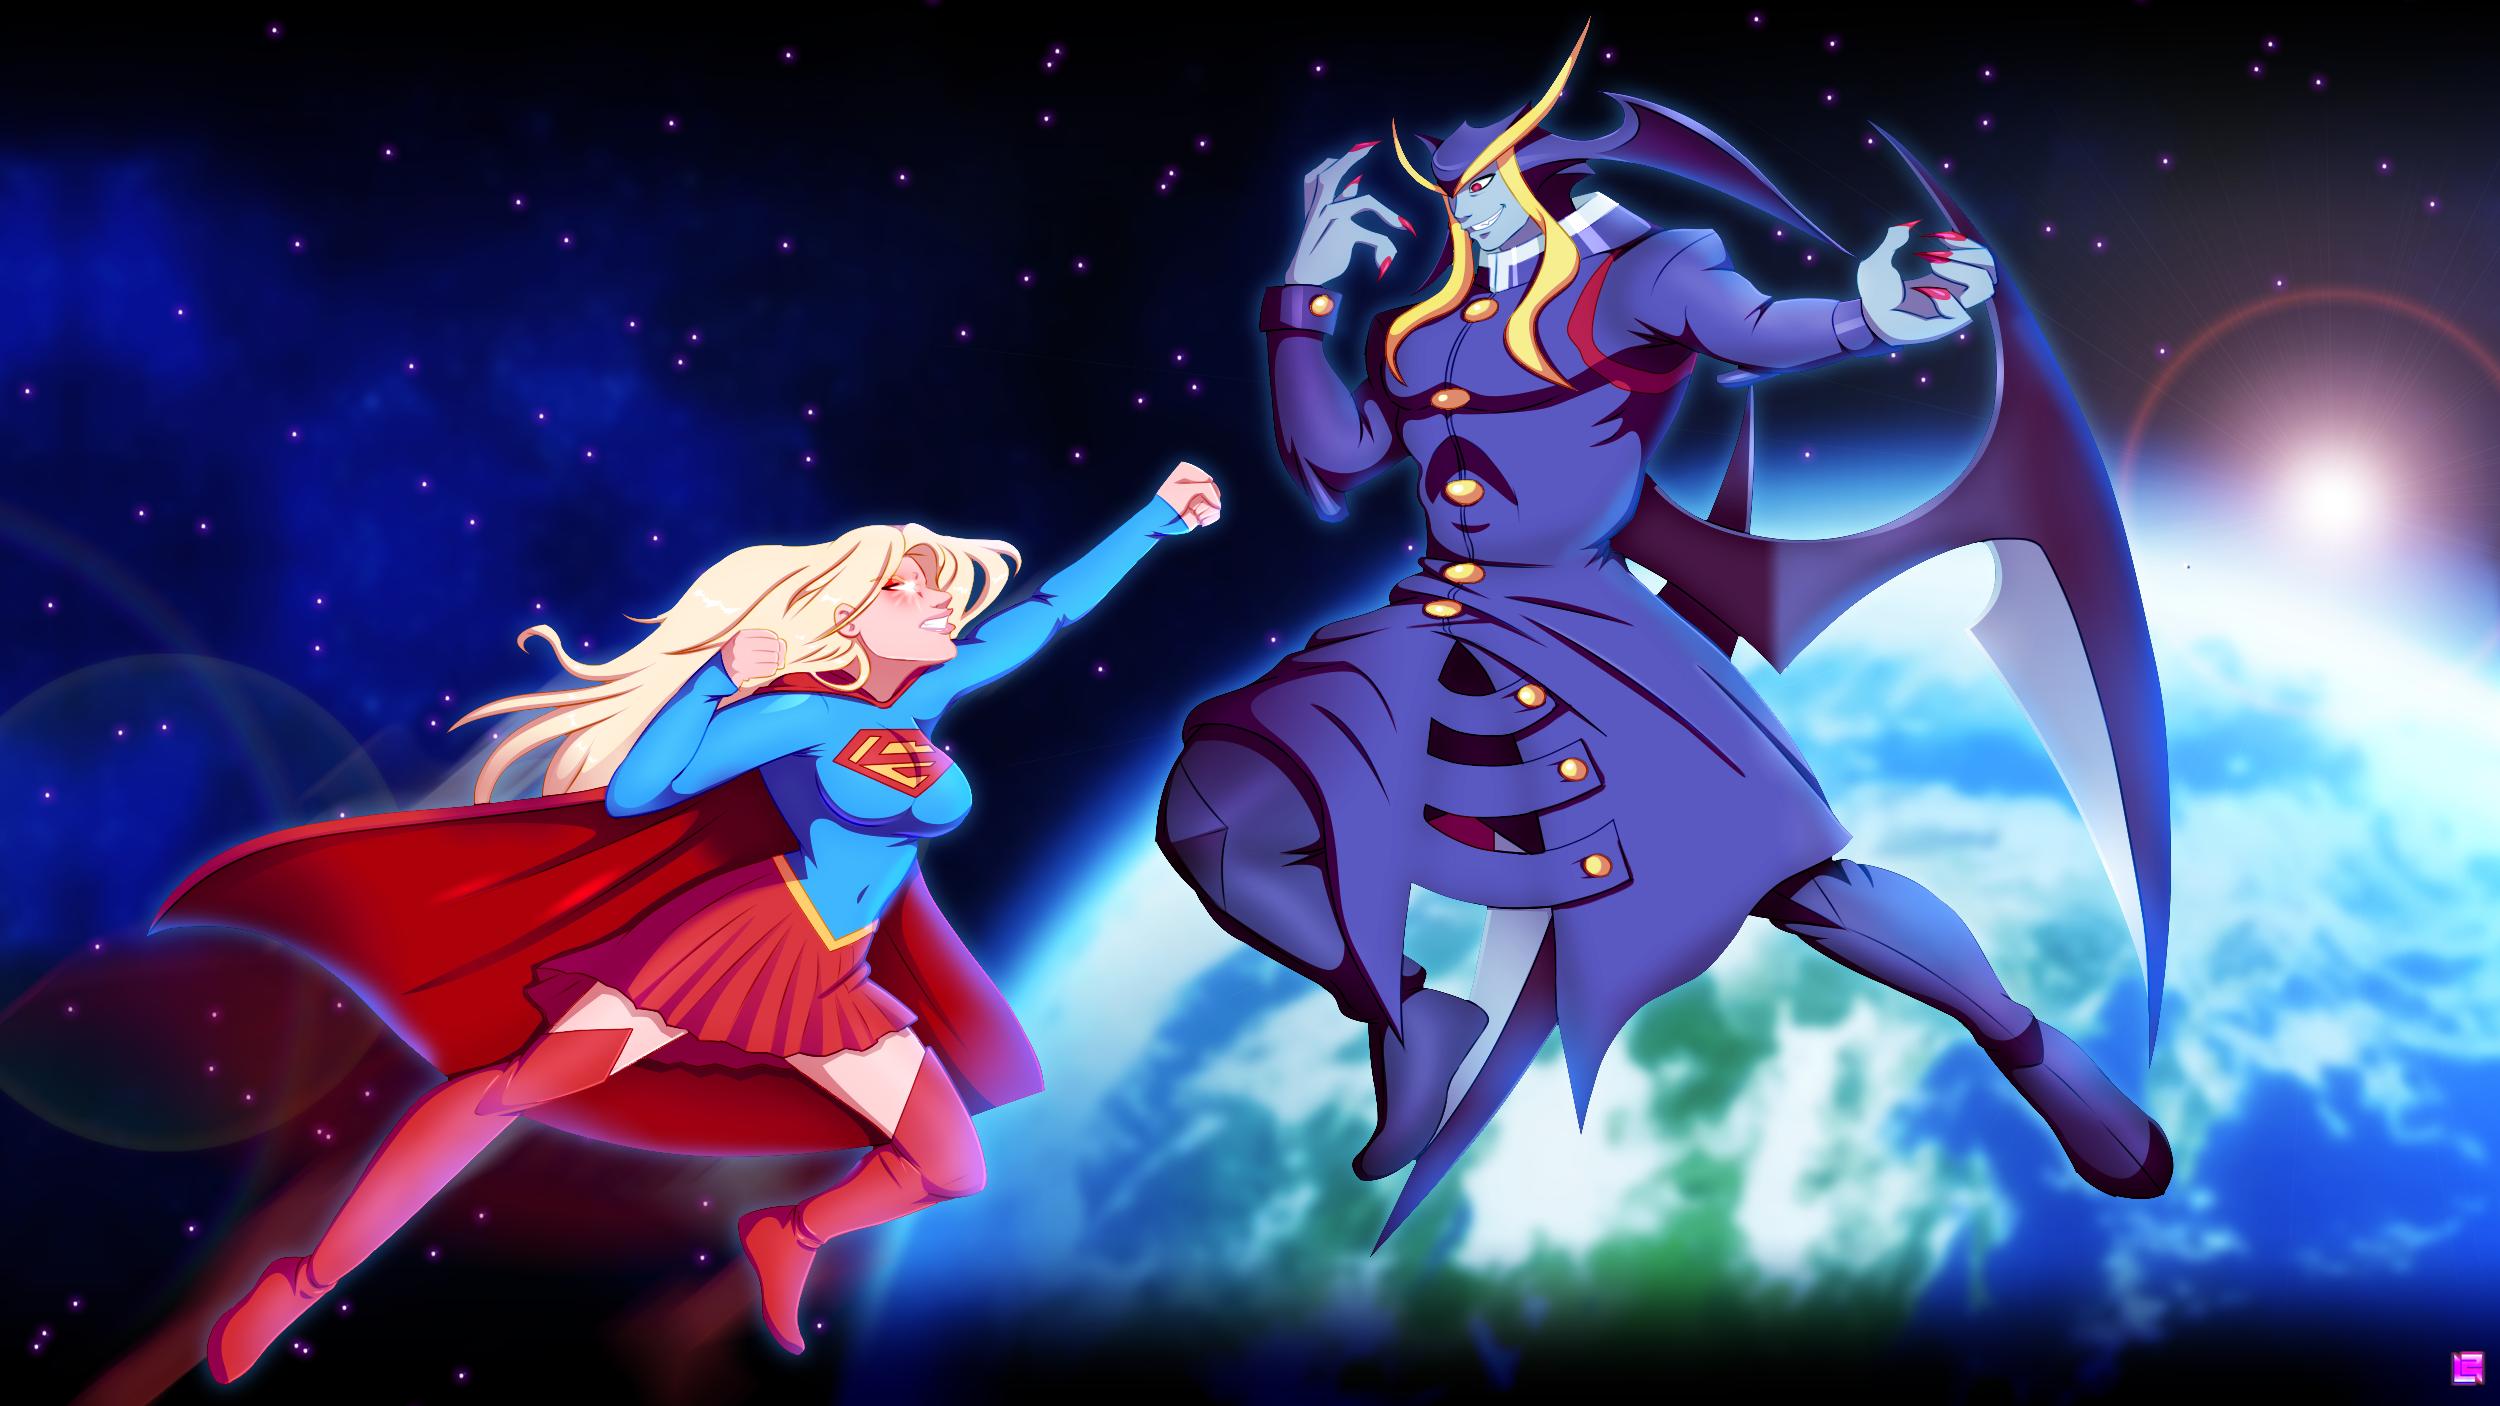 supergirl VS jedah